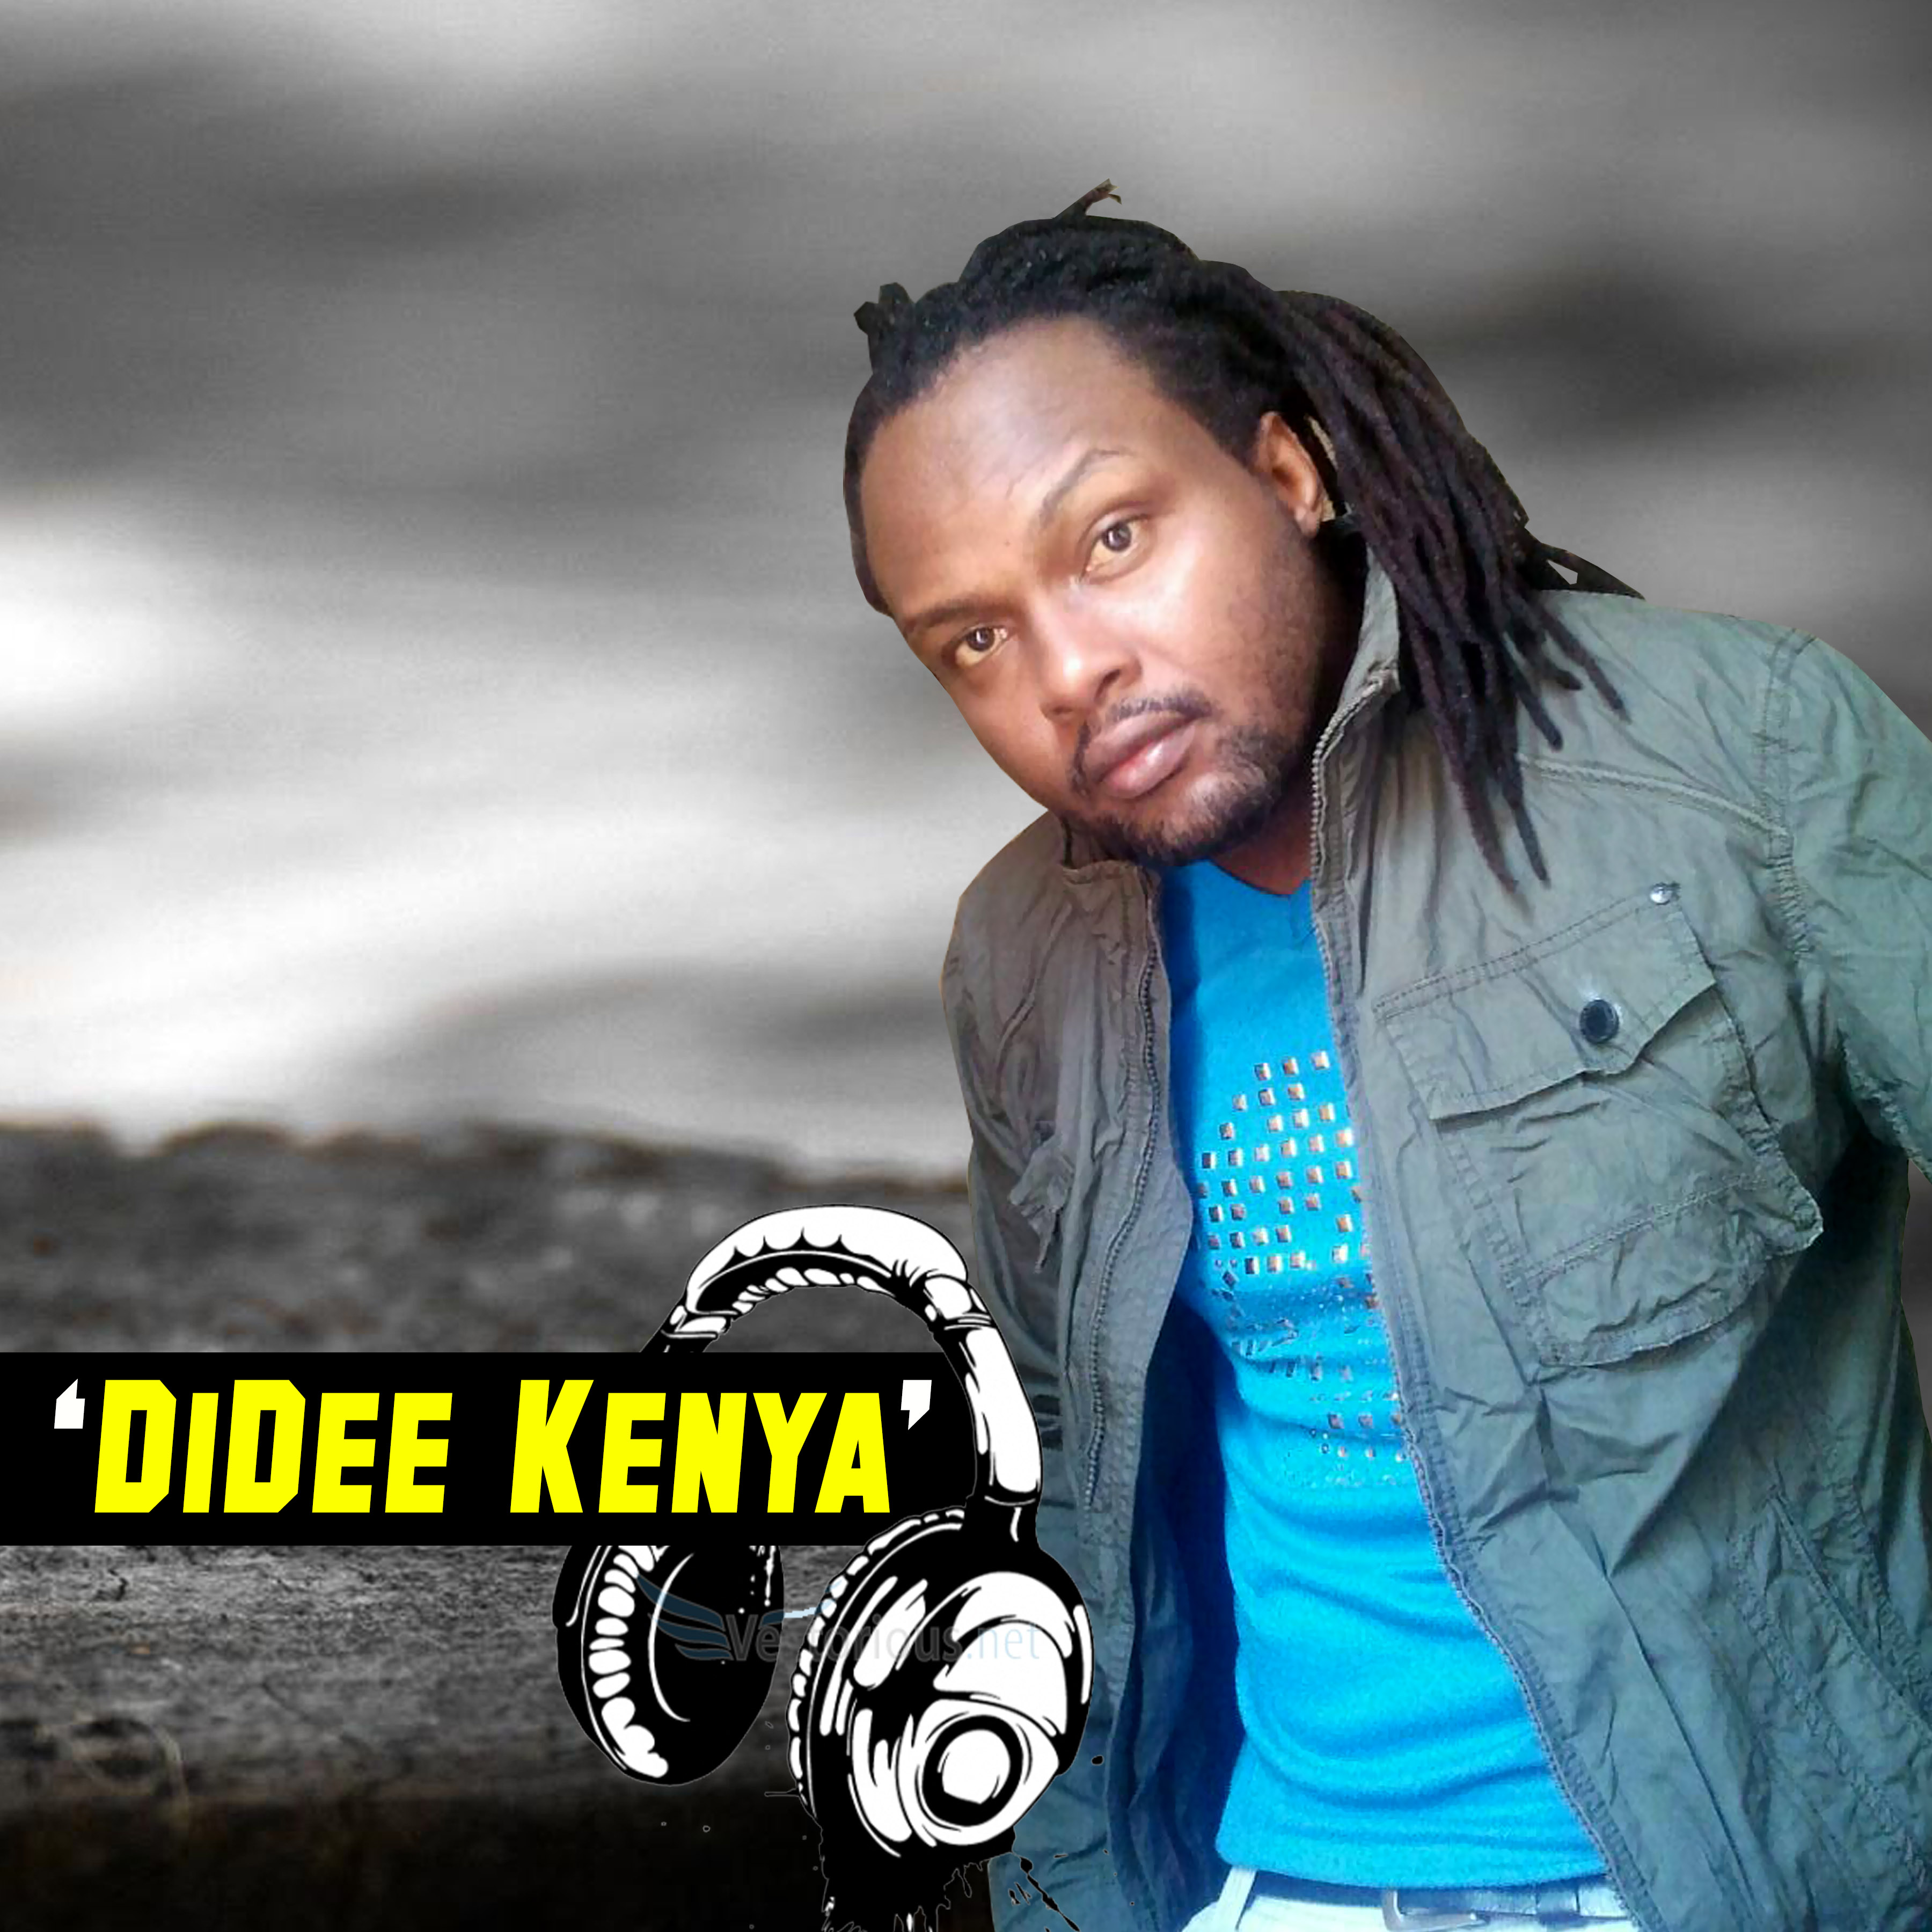 Didee Kenya - NakuFeel (ft.Hypemasta Kavalier)